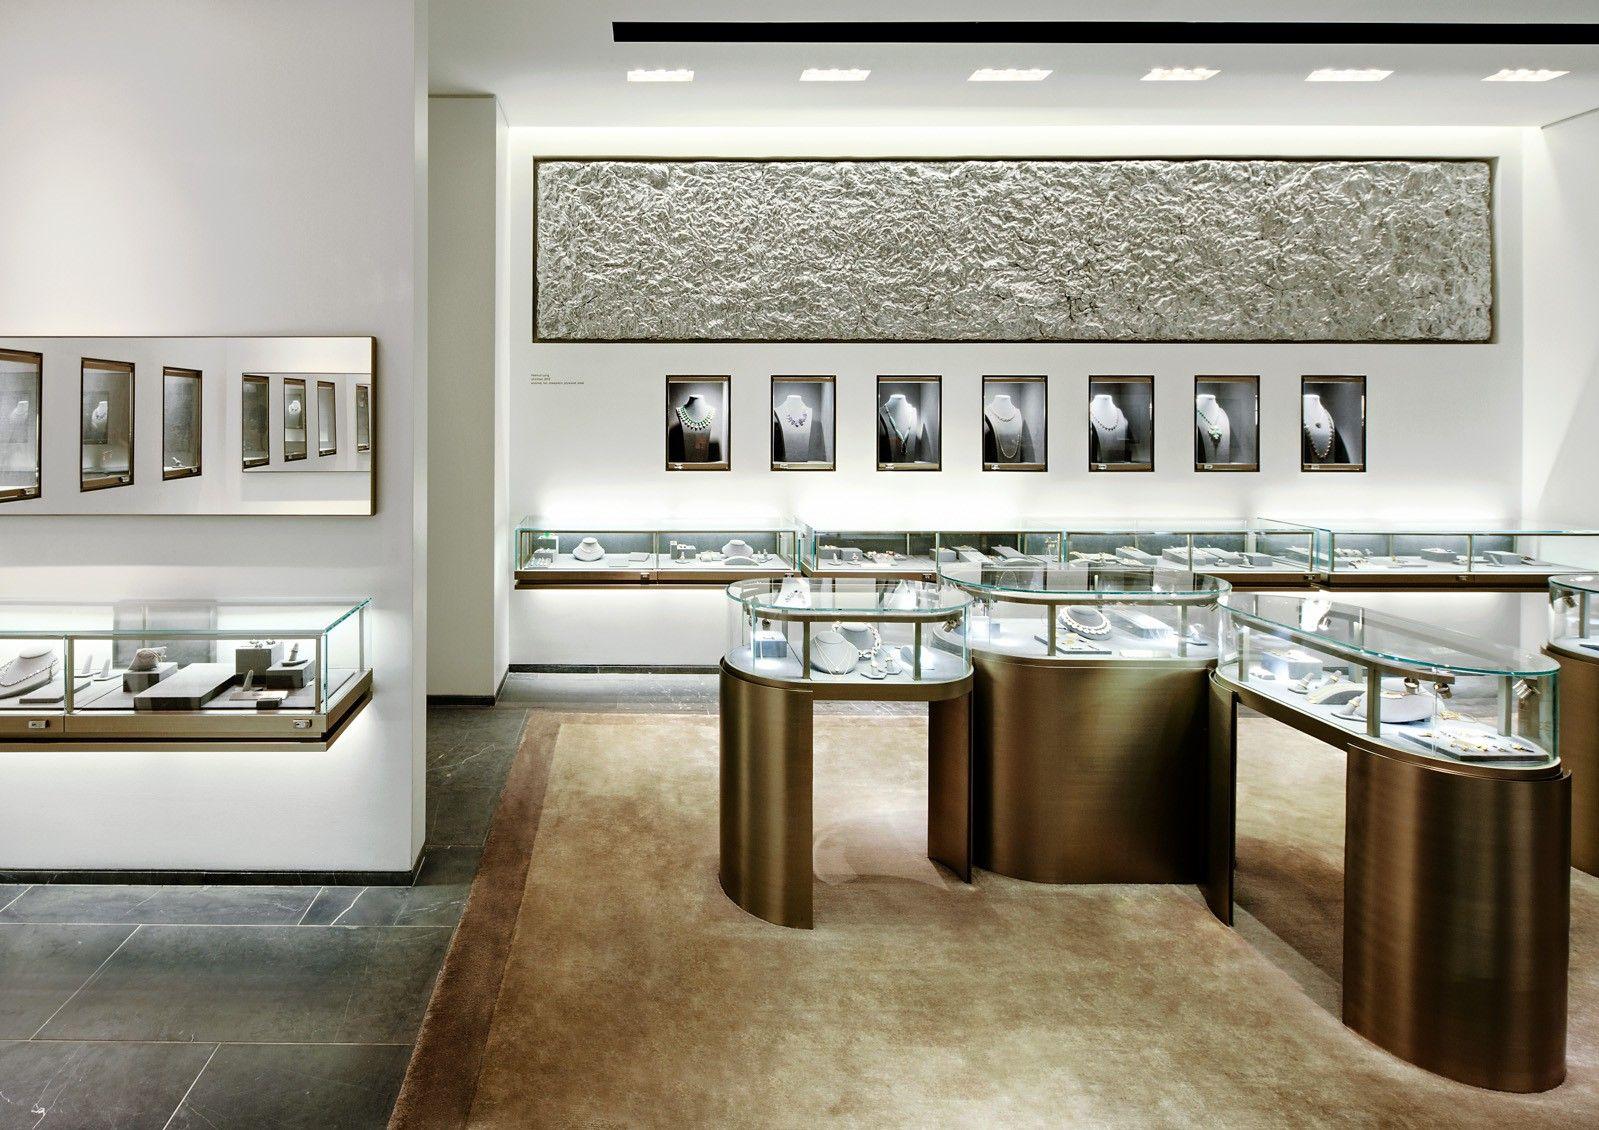 Yabu pushelberg interior design firm billionaire